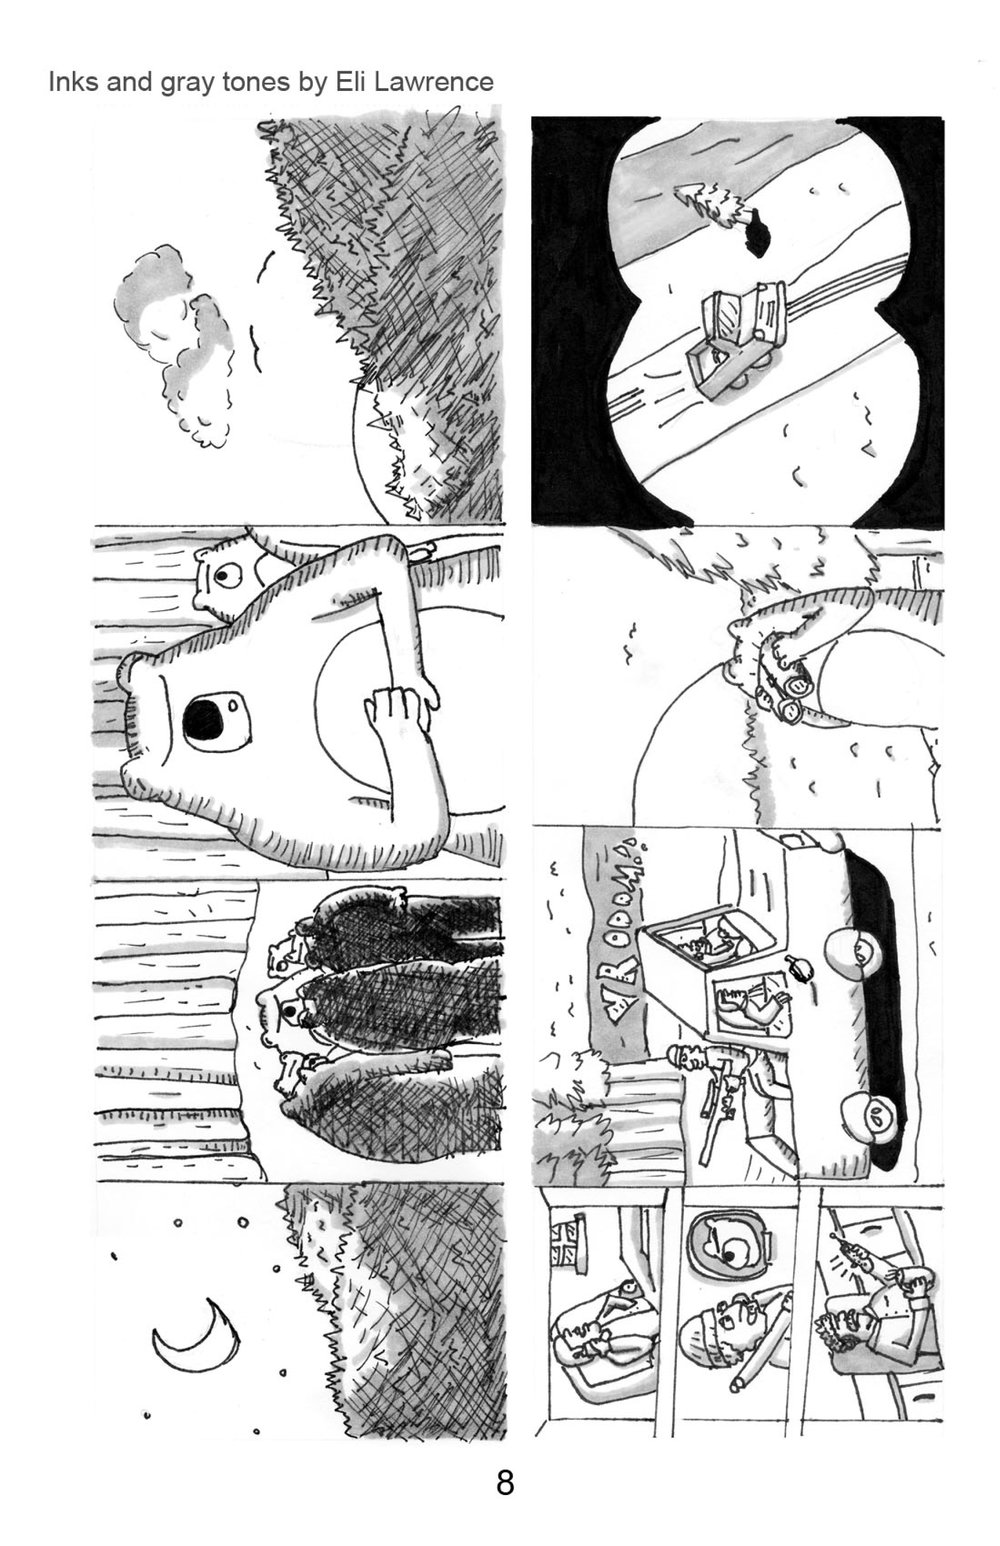 ev page 8.jpg